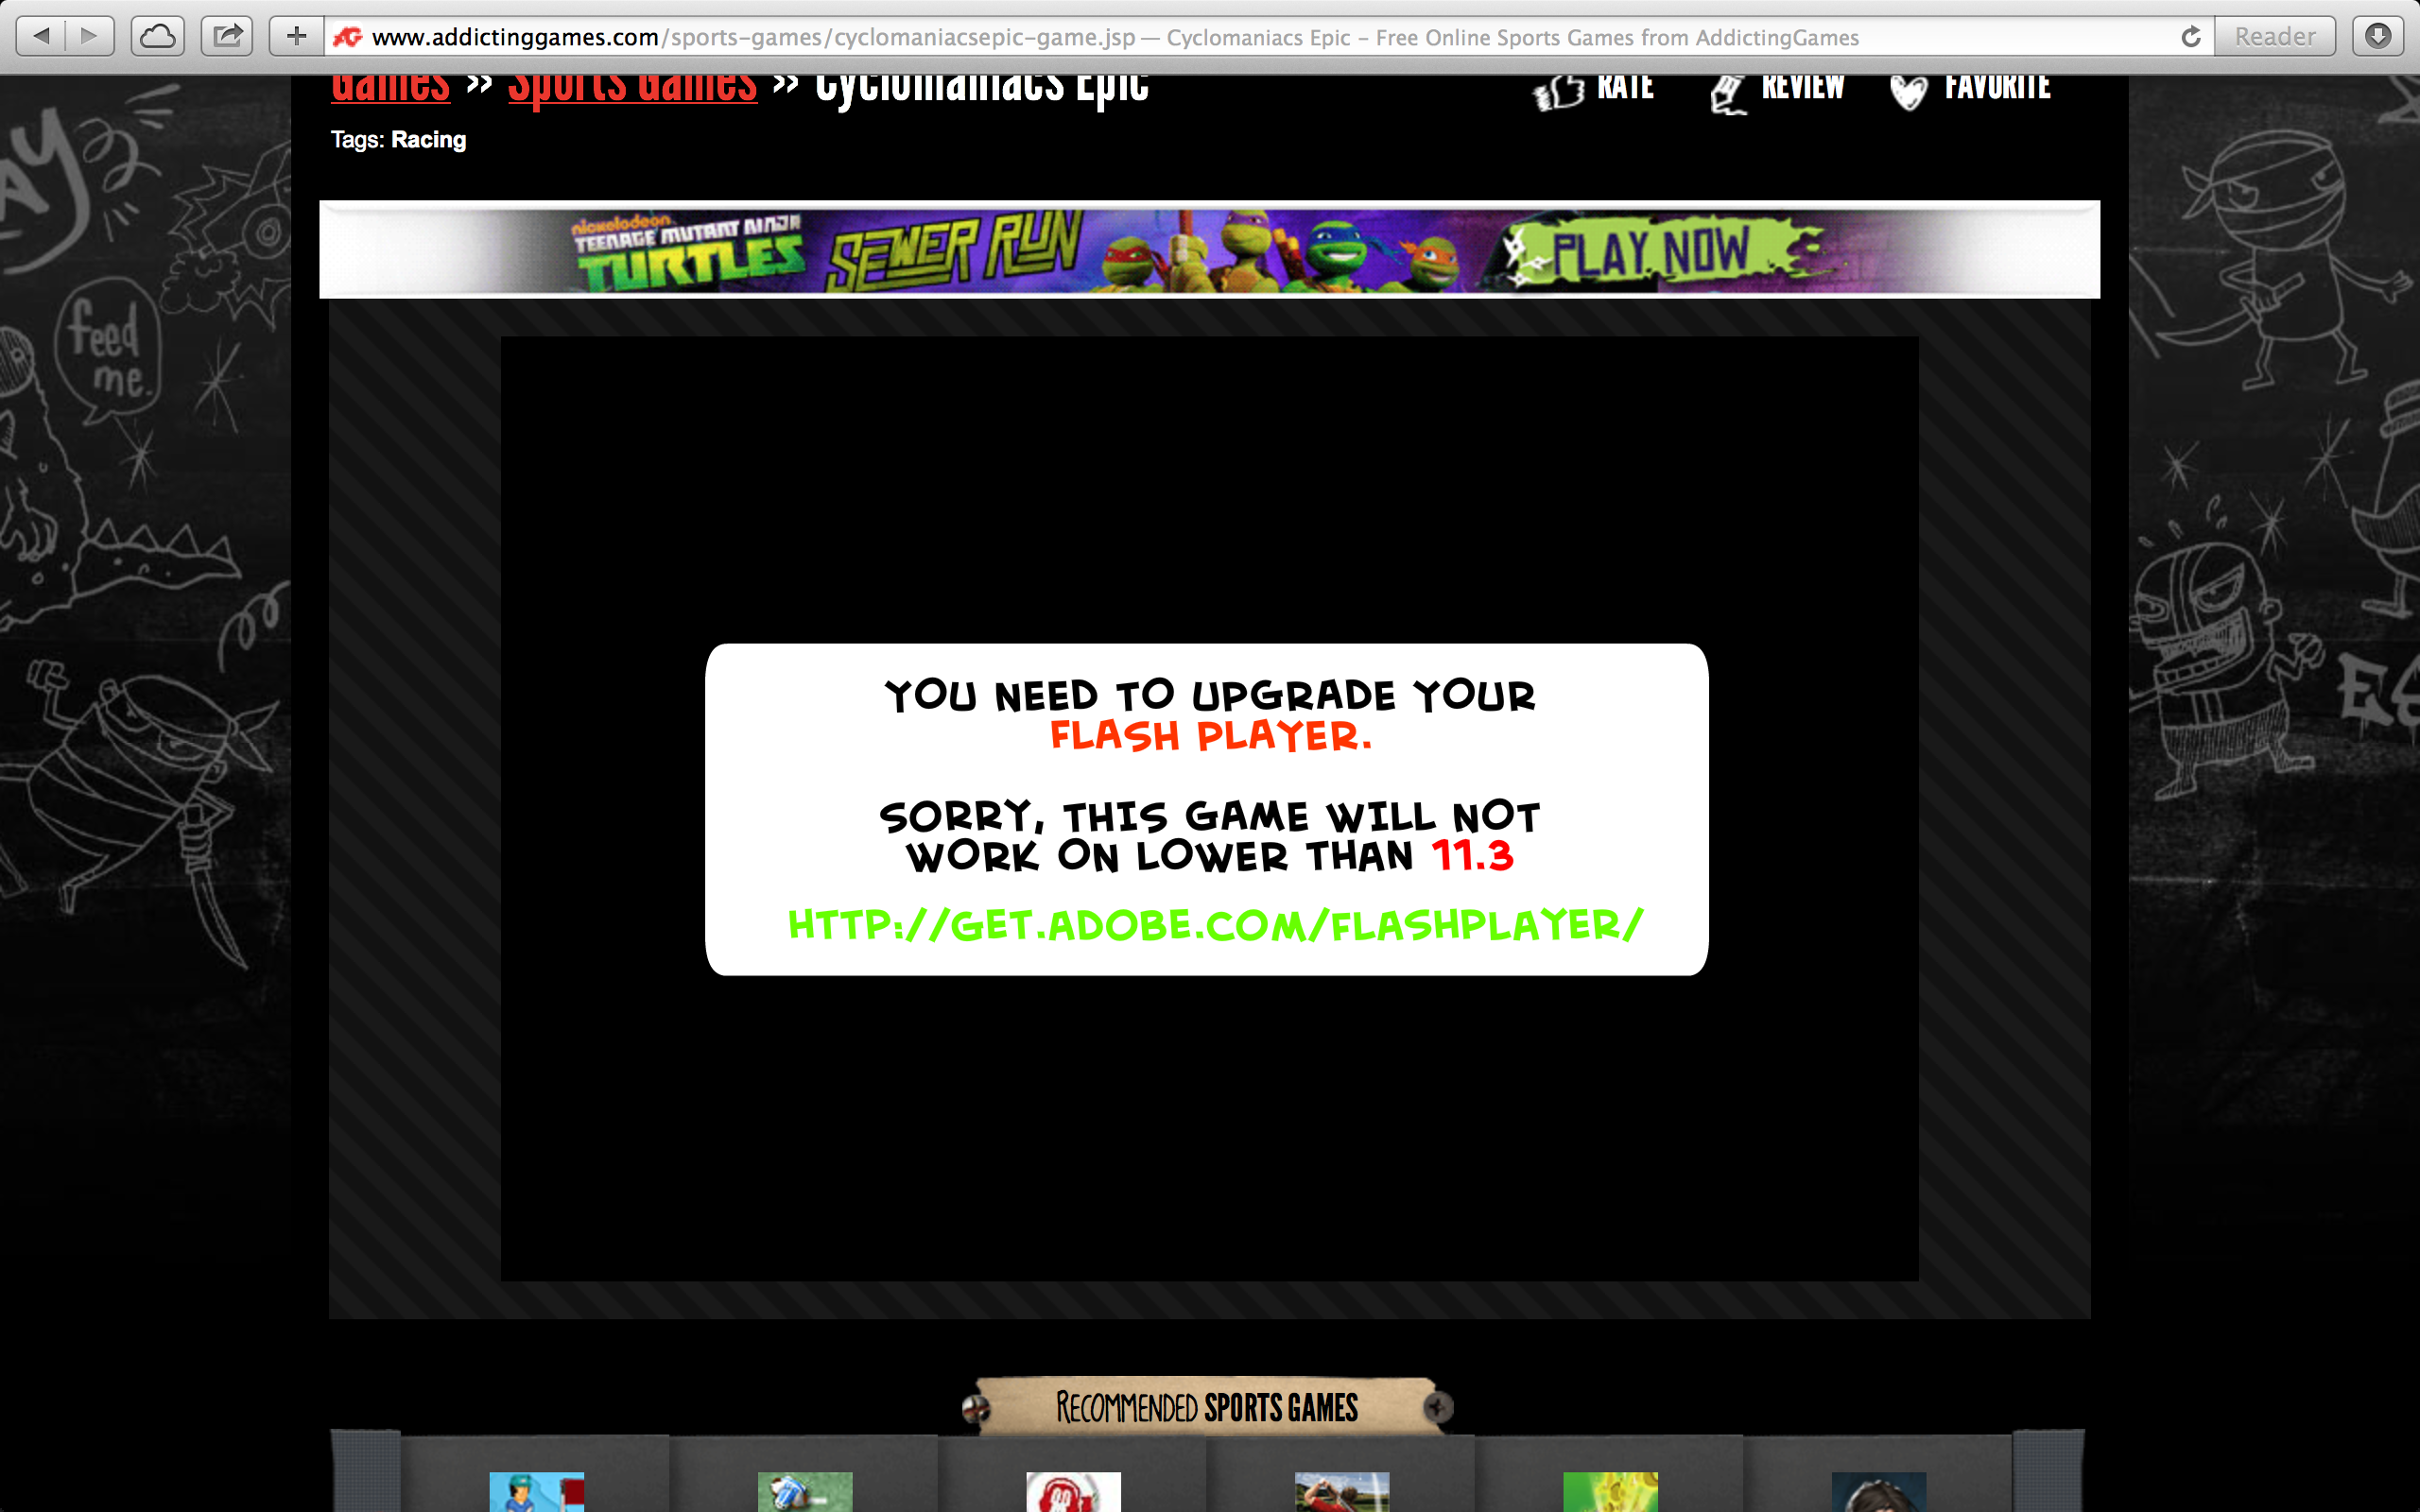 Games | free online games & download games | play games on shockwave.